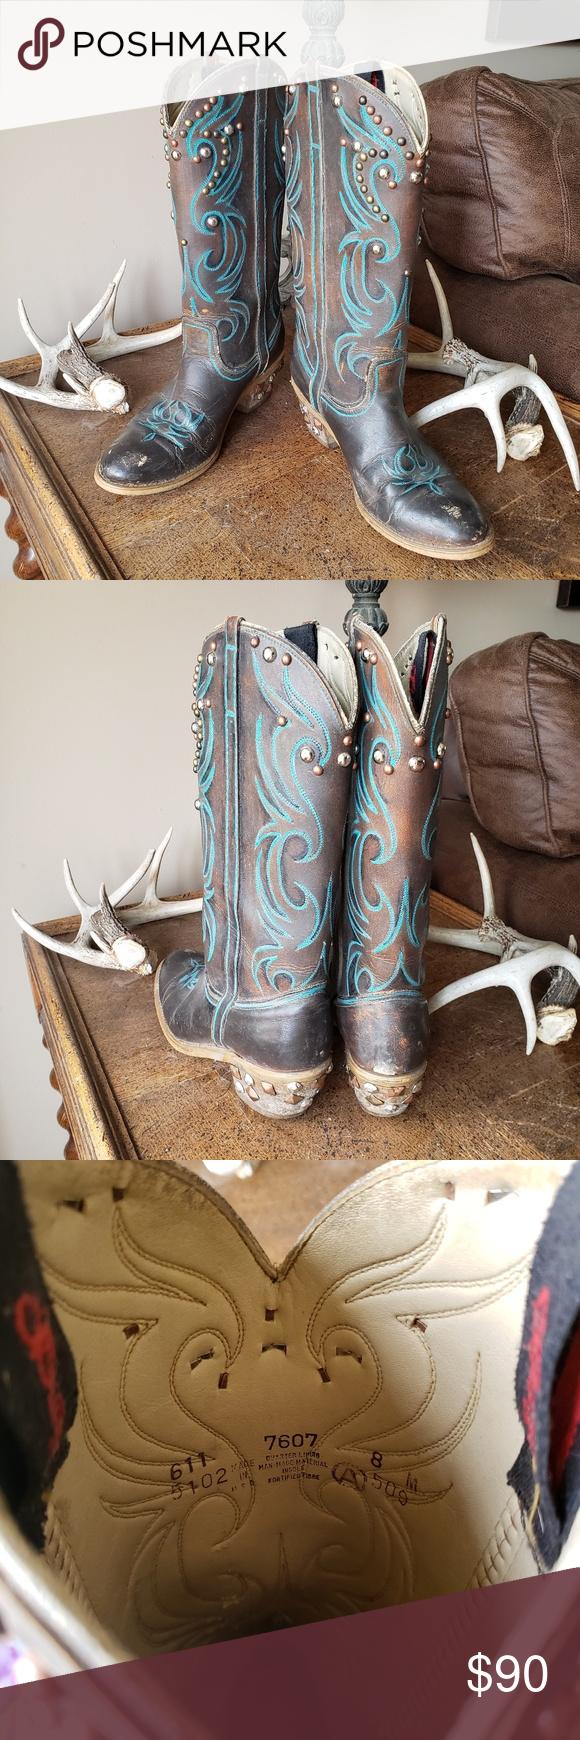 67e2ace0efa Dingo | Vintage Cowboy Boots One of a kind vintage cowboy/cowgirl ...